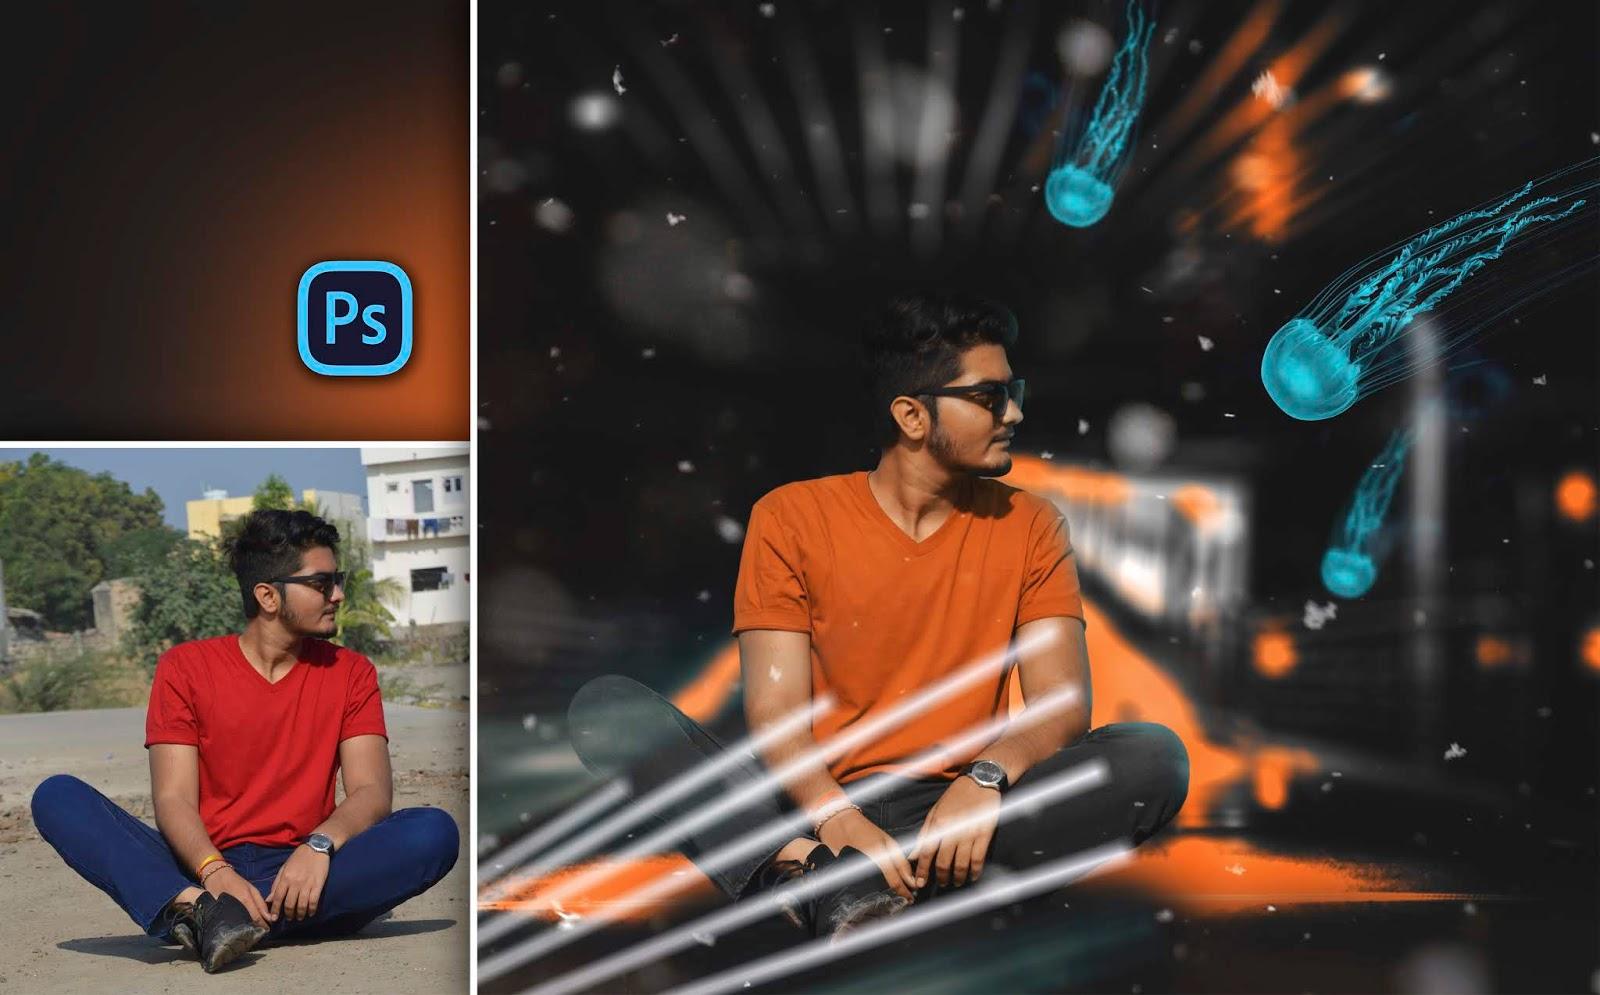 New Visual Editing Concept + Moody Instagram Photo Manipulation in Photoshop   Fantasy Like Photo Editing